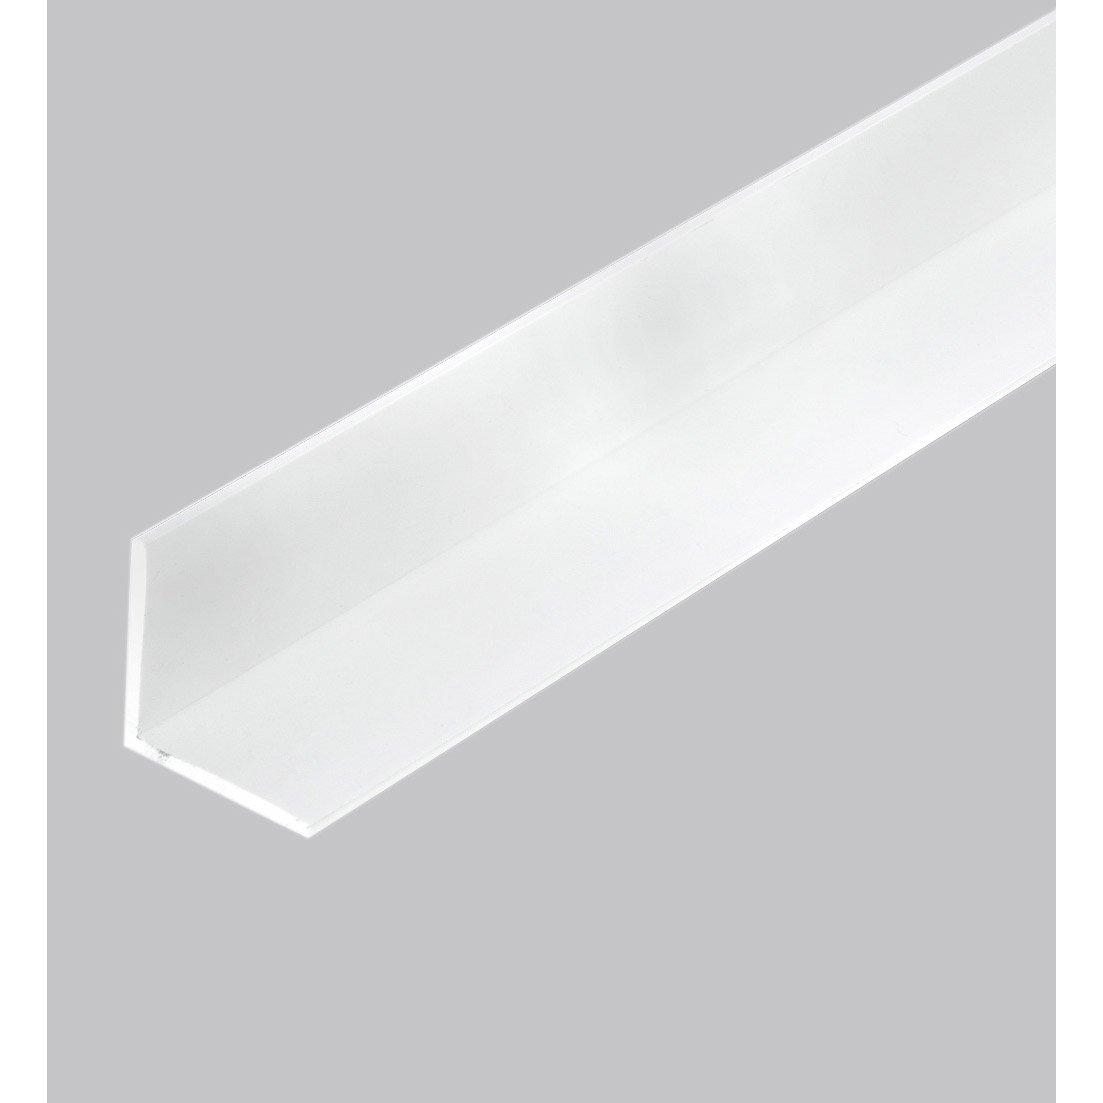 Baguette D Angle Plafond moulure d angle plafond - jenniferdouglasliterarypublicist